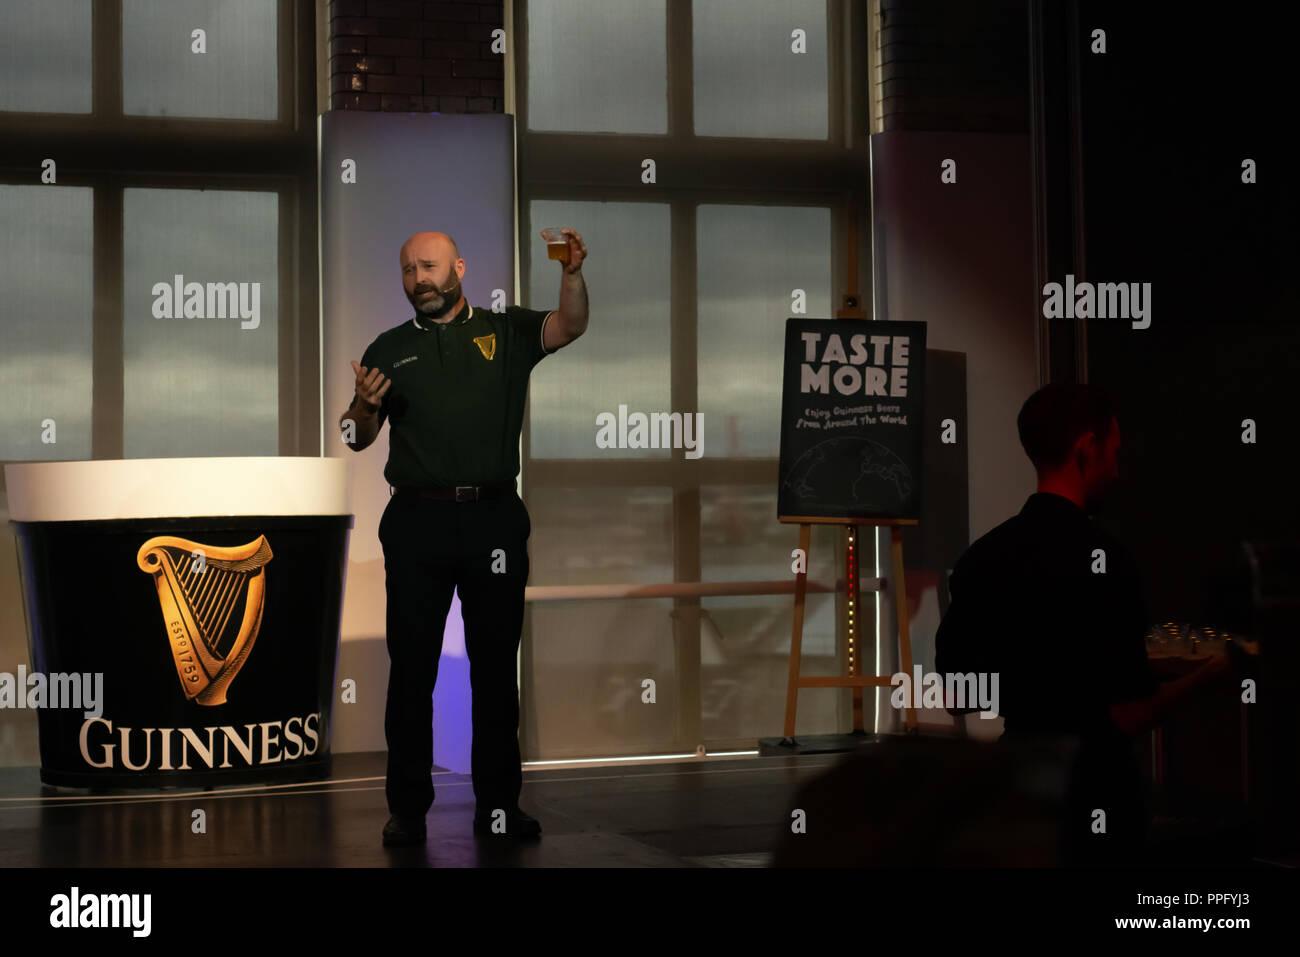 Guinness Storehouse Dublin. Live show. Presenter demonstrates on stage the Guinness Experience. St. James, Dublin, Ireland - Stock Image